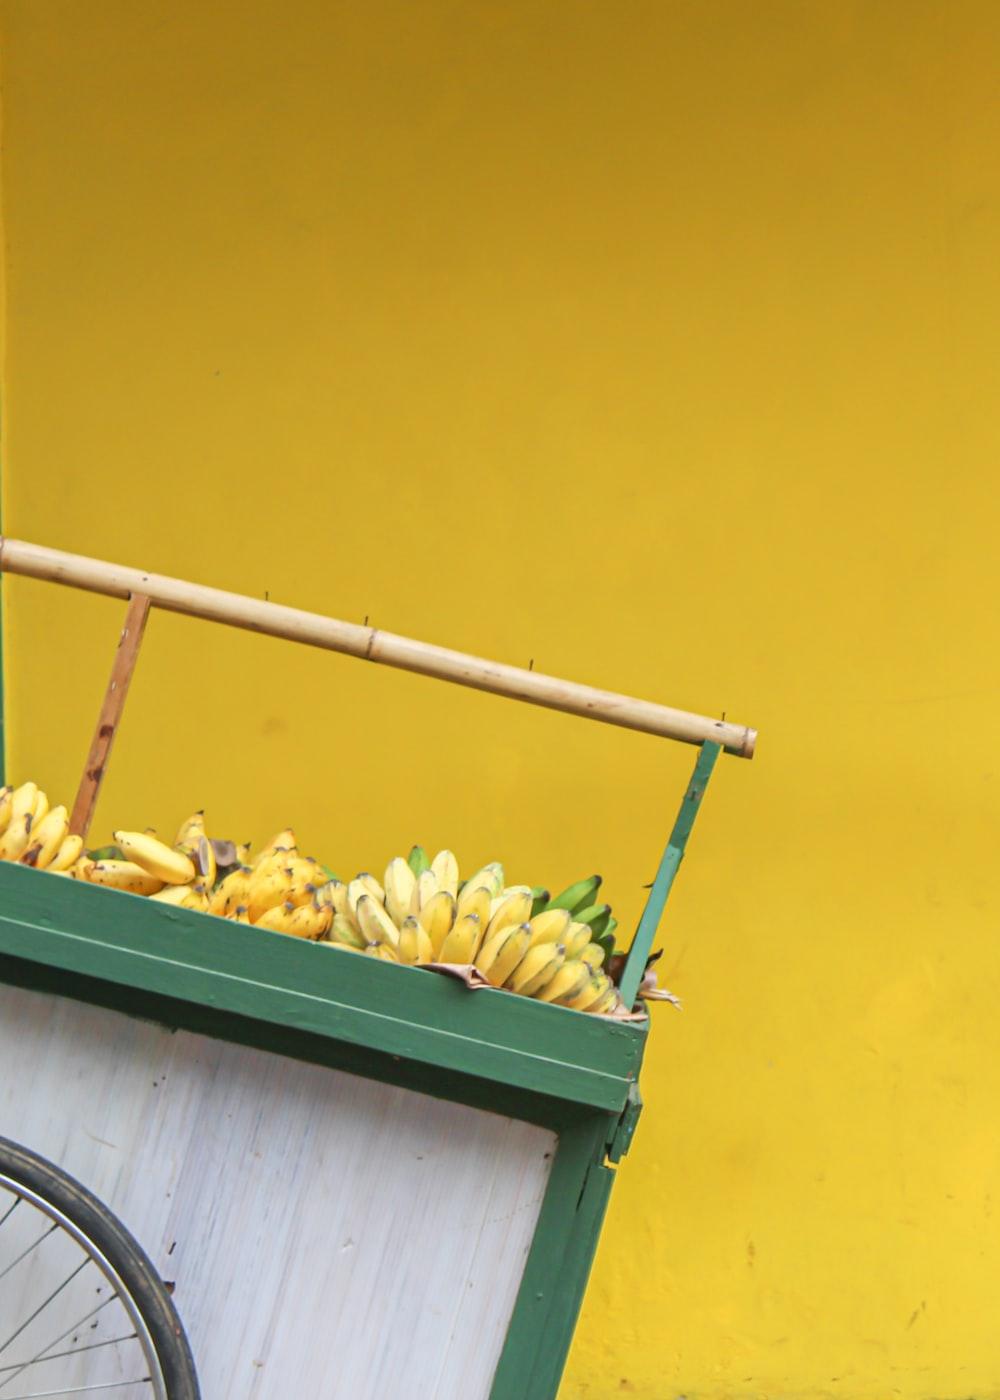 yellow banana fruit on green wooden wall